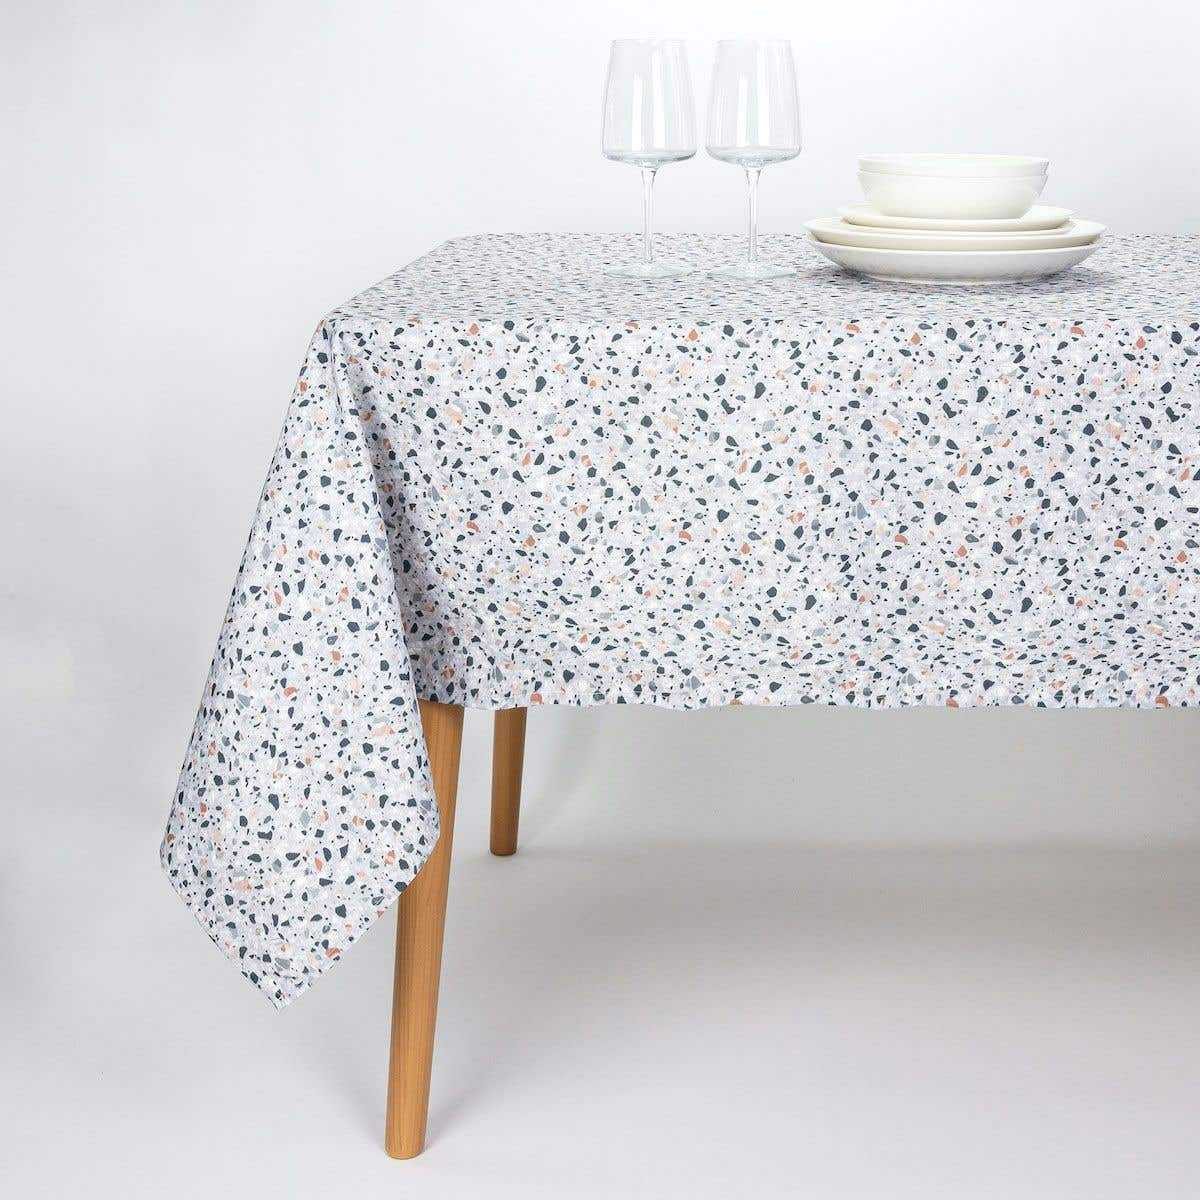 Linge de table collection « Granite »